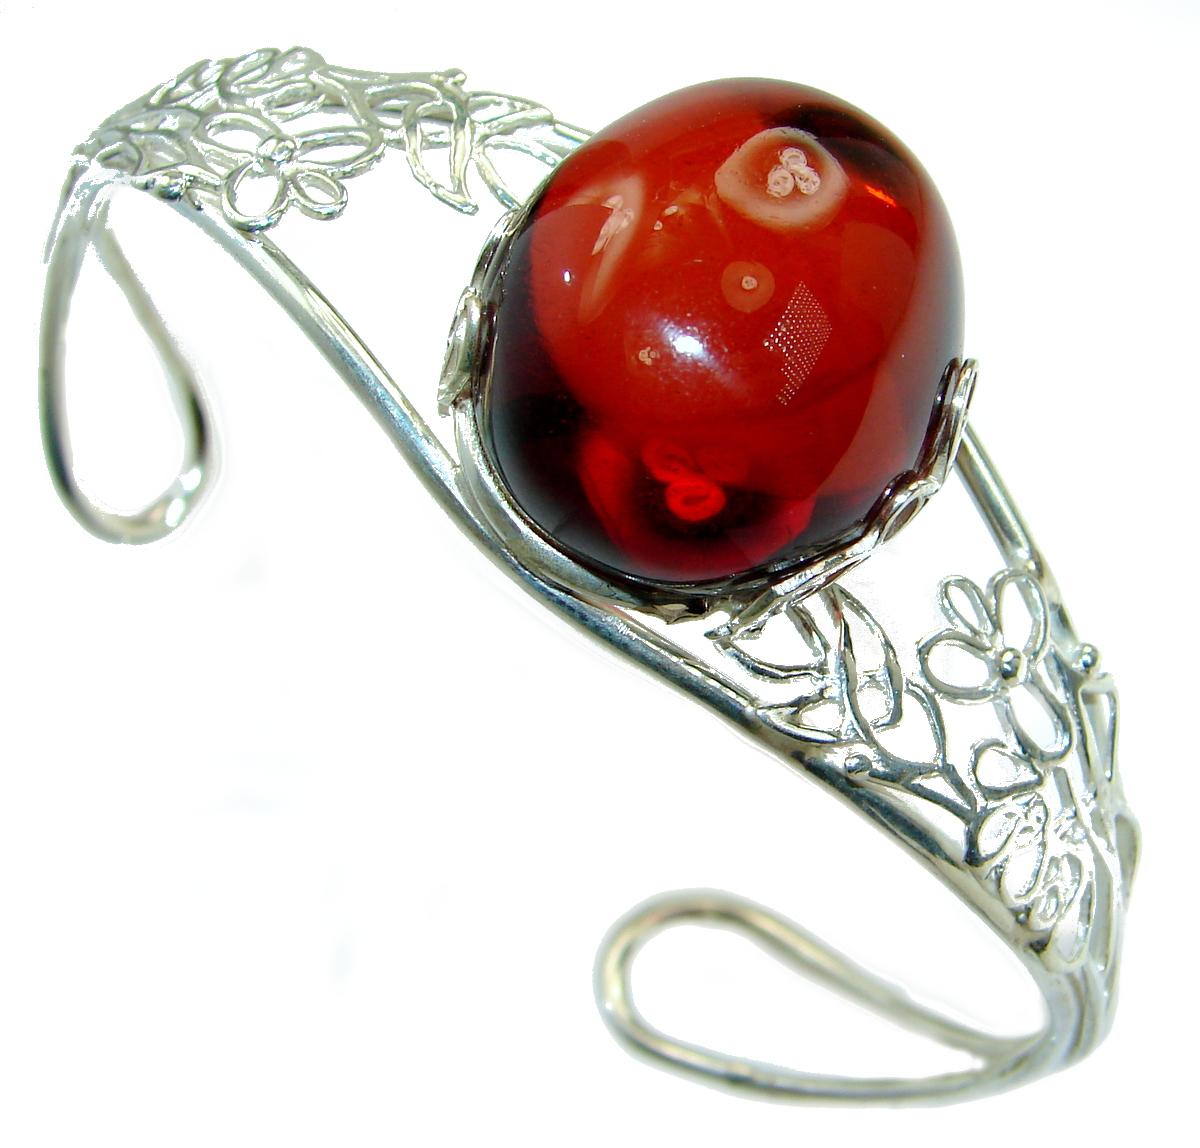 Gorgeous Classic Design Polish Amber Sterling Silver Bracelet / Cuff